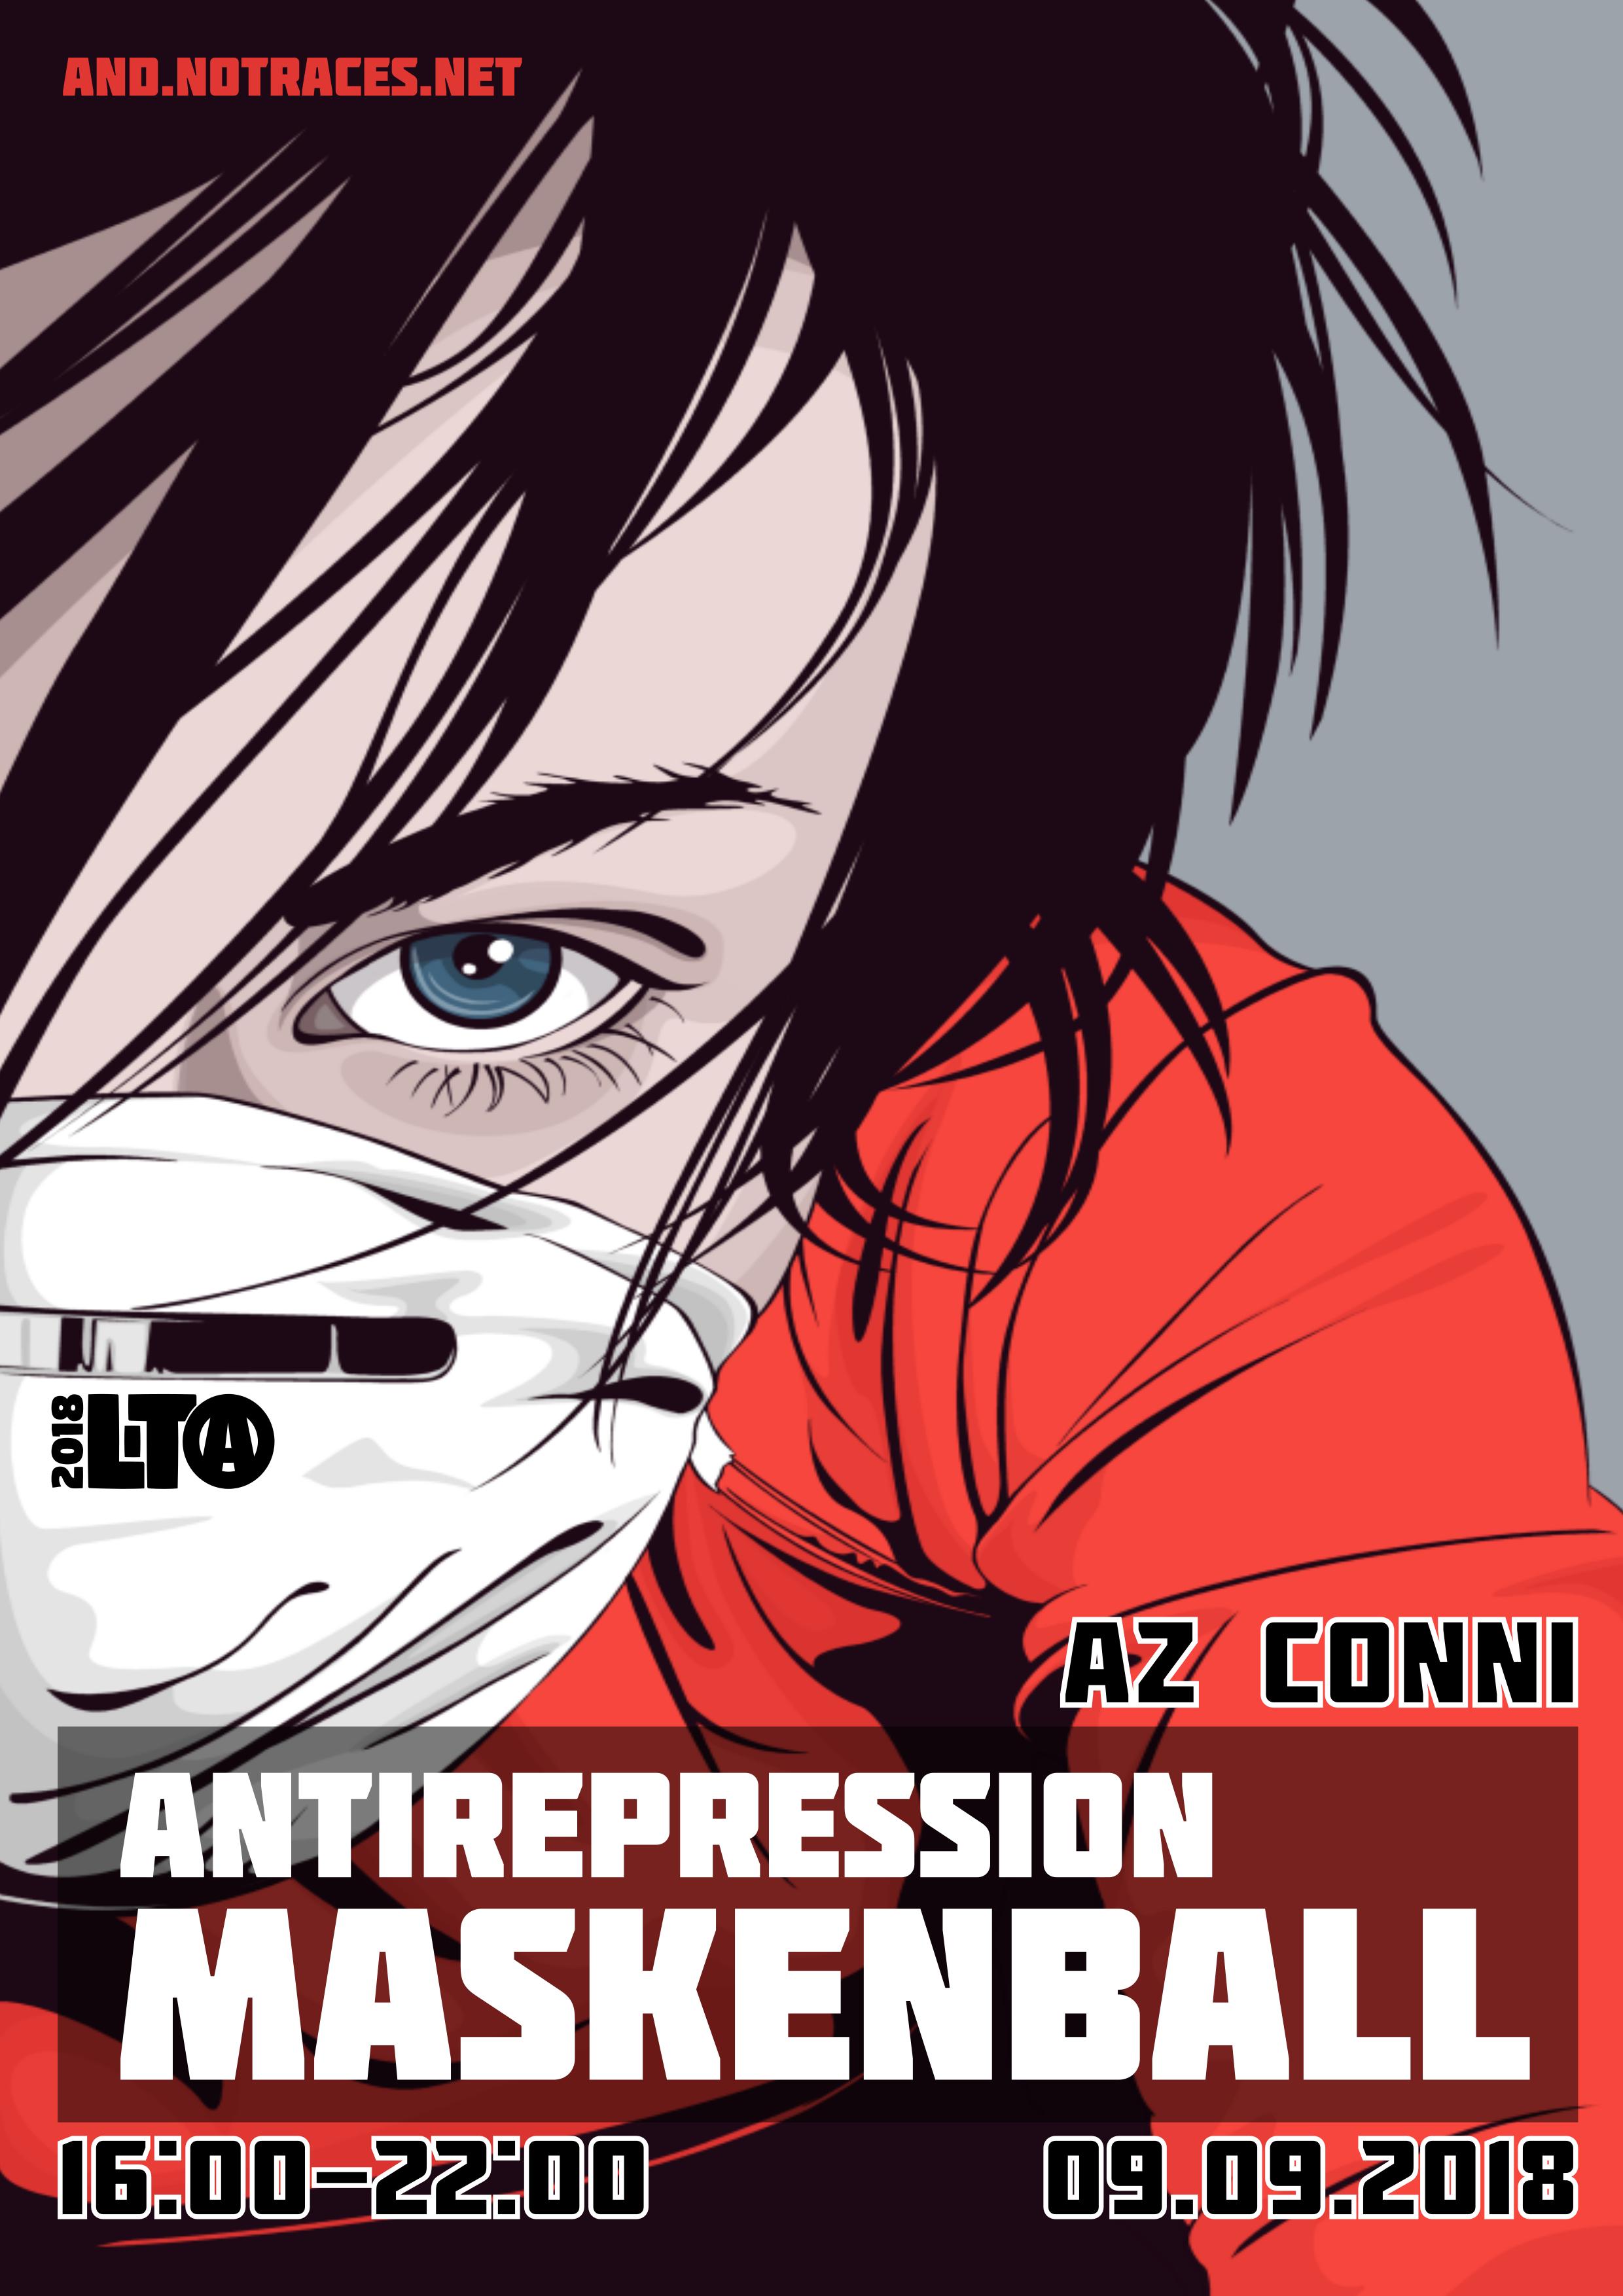 09.09 – Antirepressions Maskenball